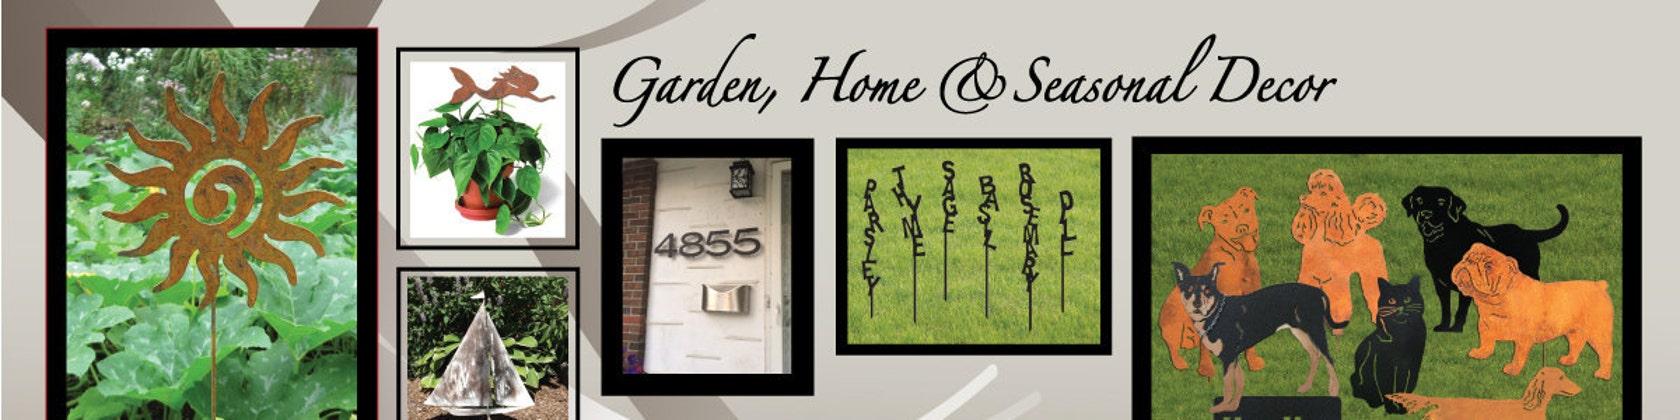 Custom Metal Art for the Home Garden & by RusticaOrnamentals